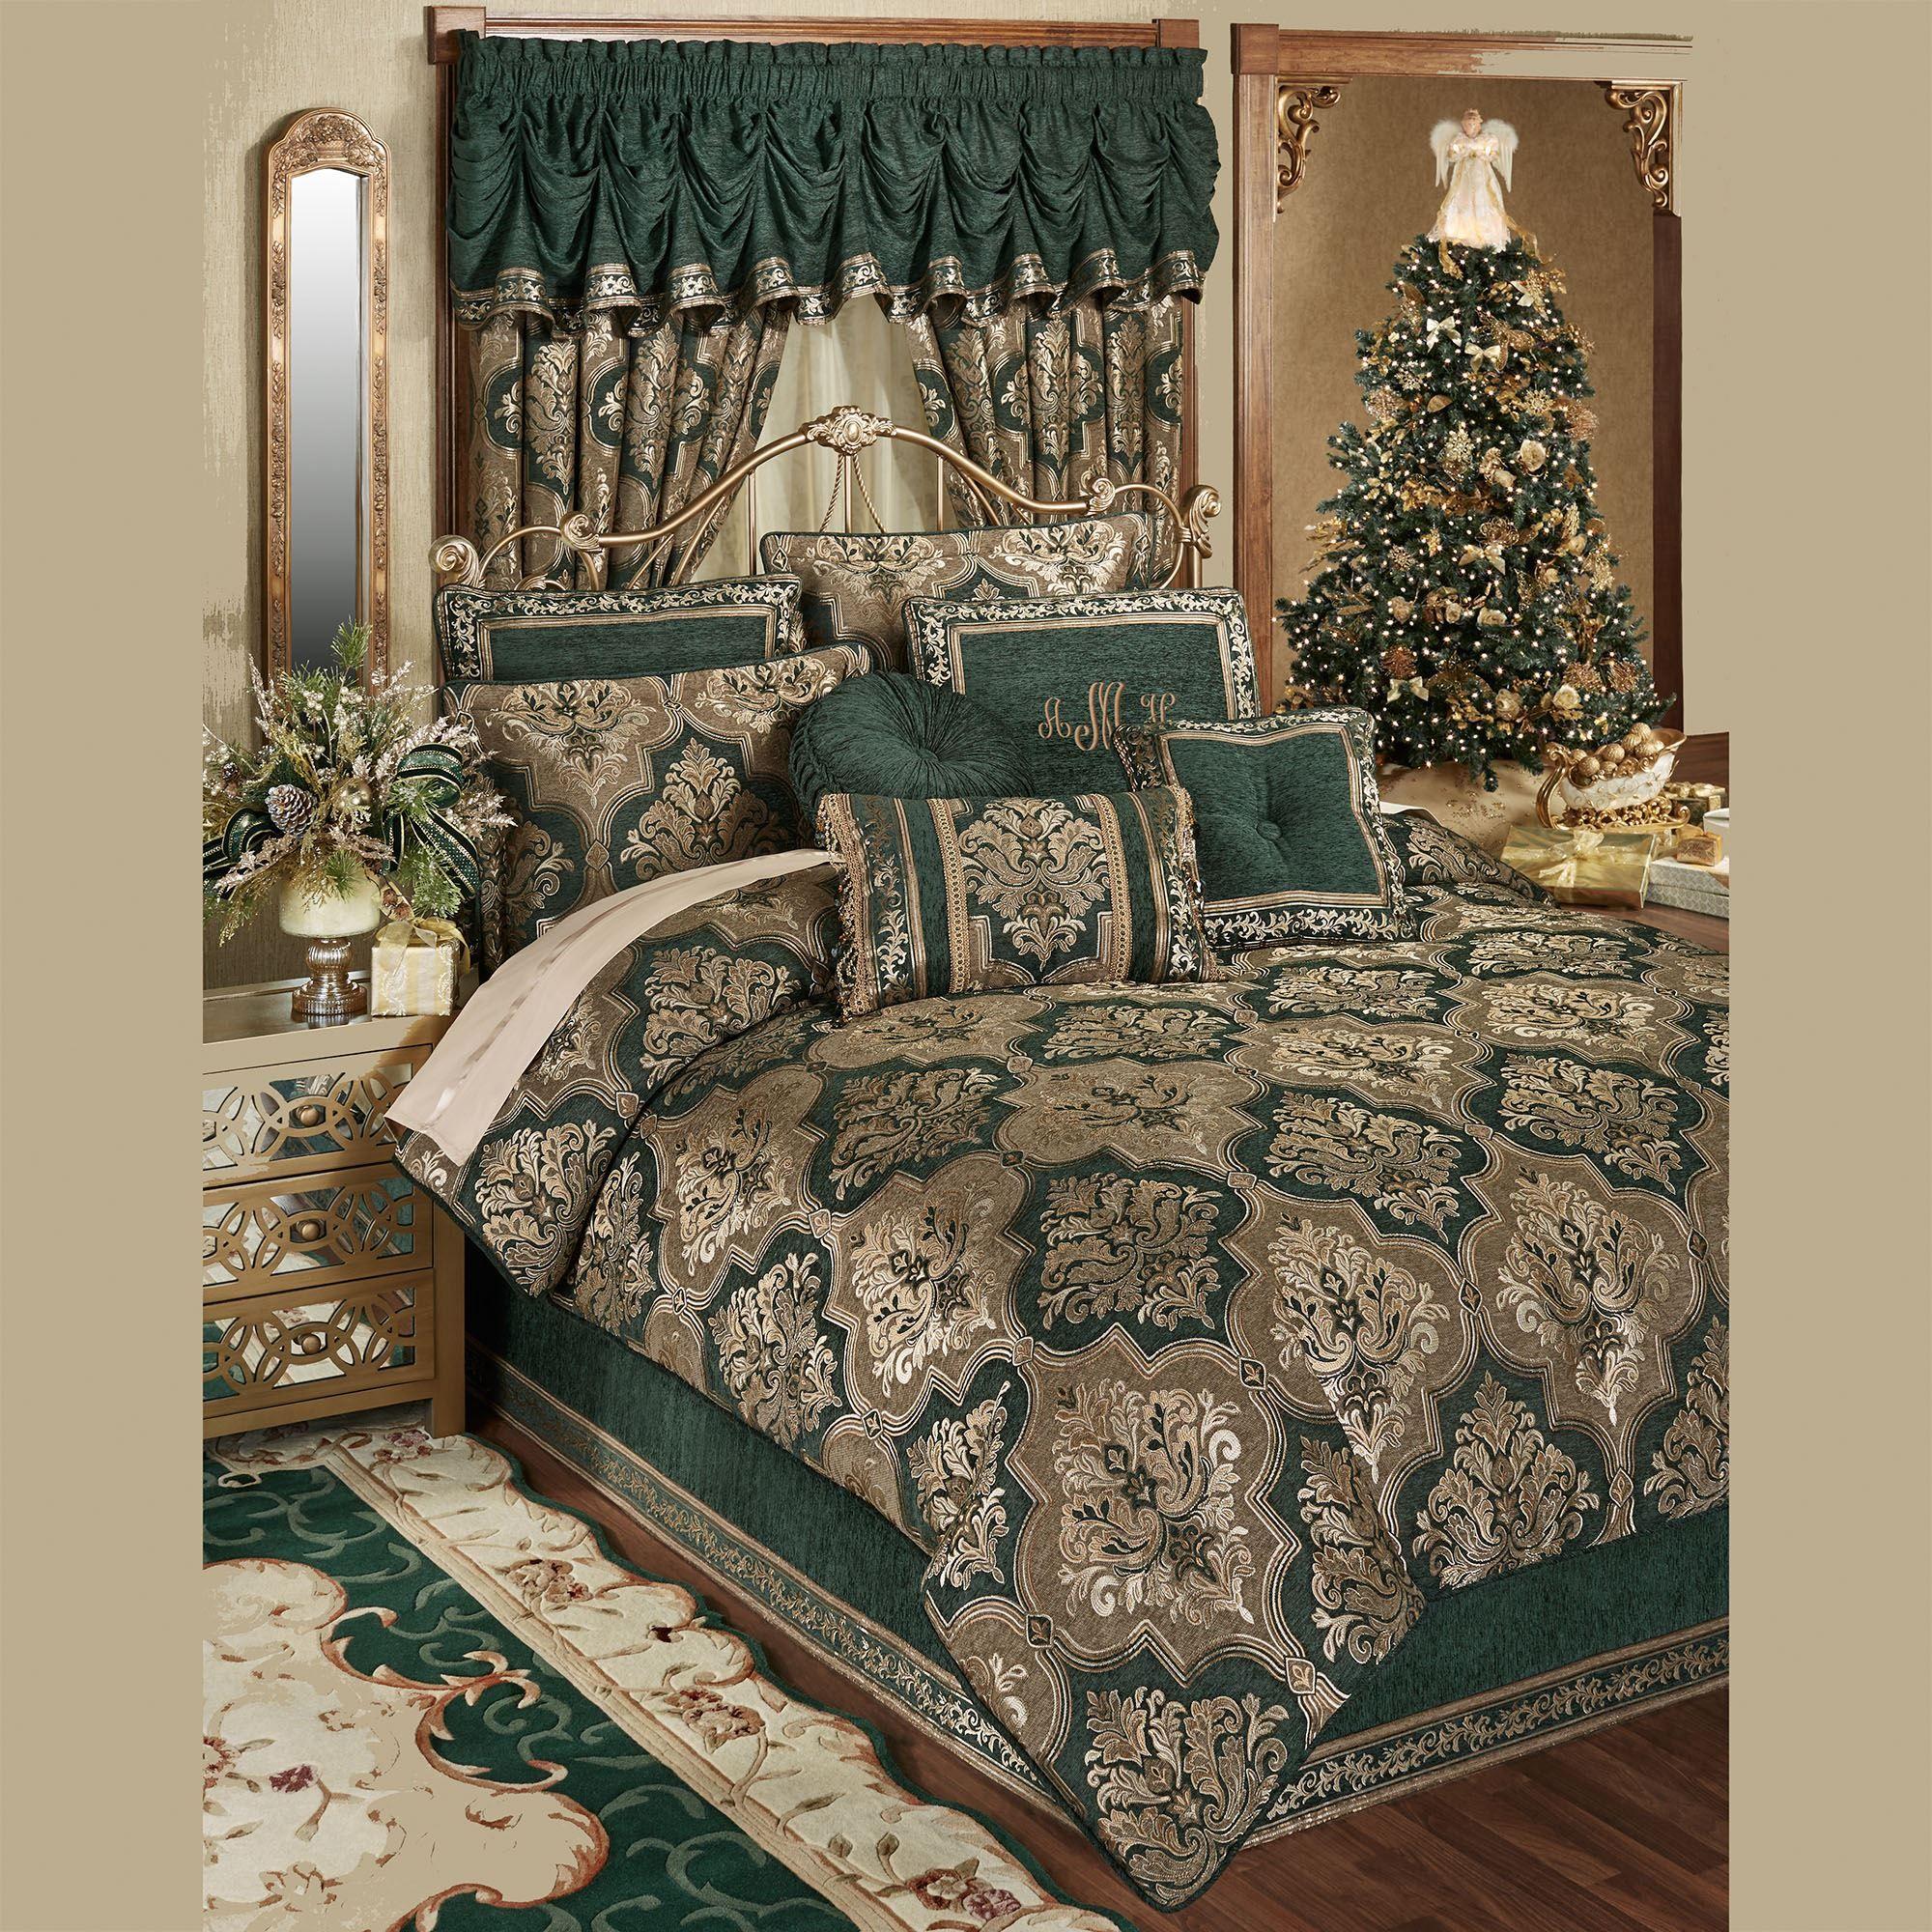 Marietta Emerald Green Damask Quatrefoil Comforter Bedding